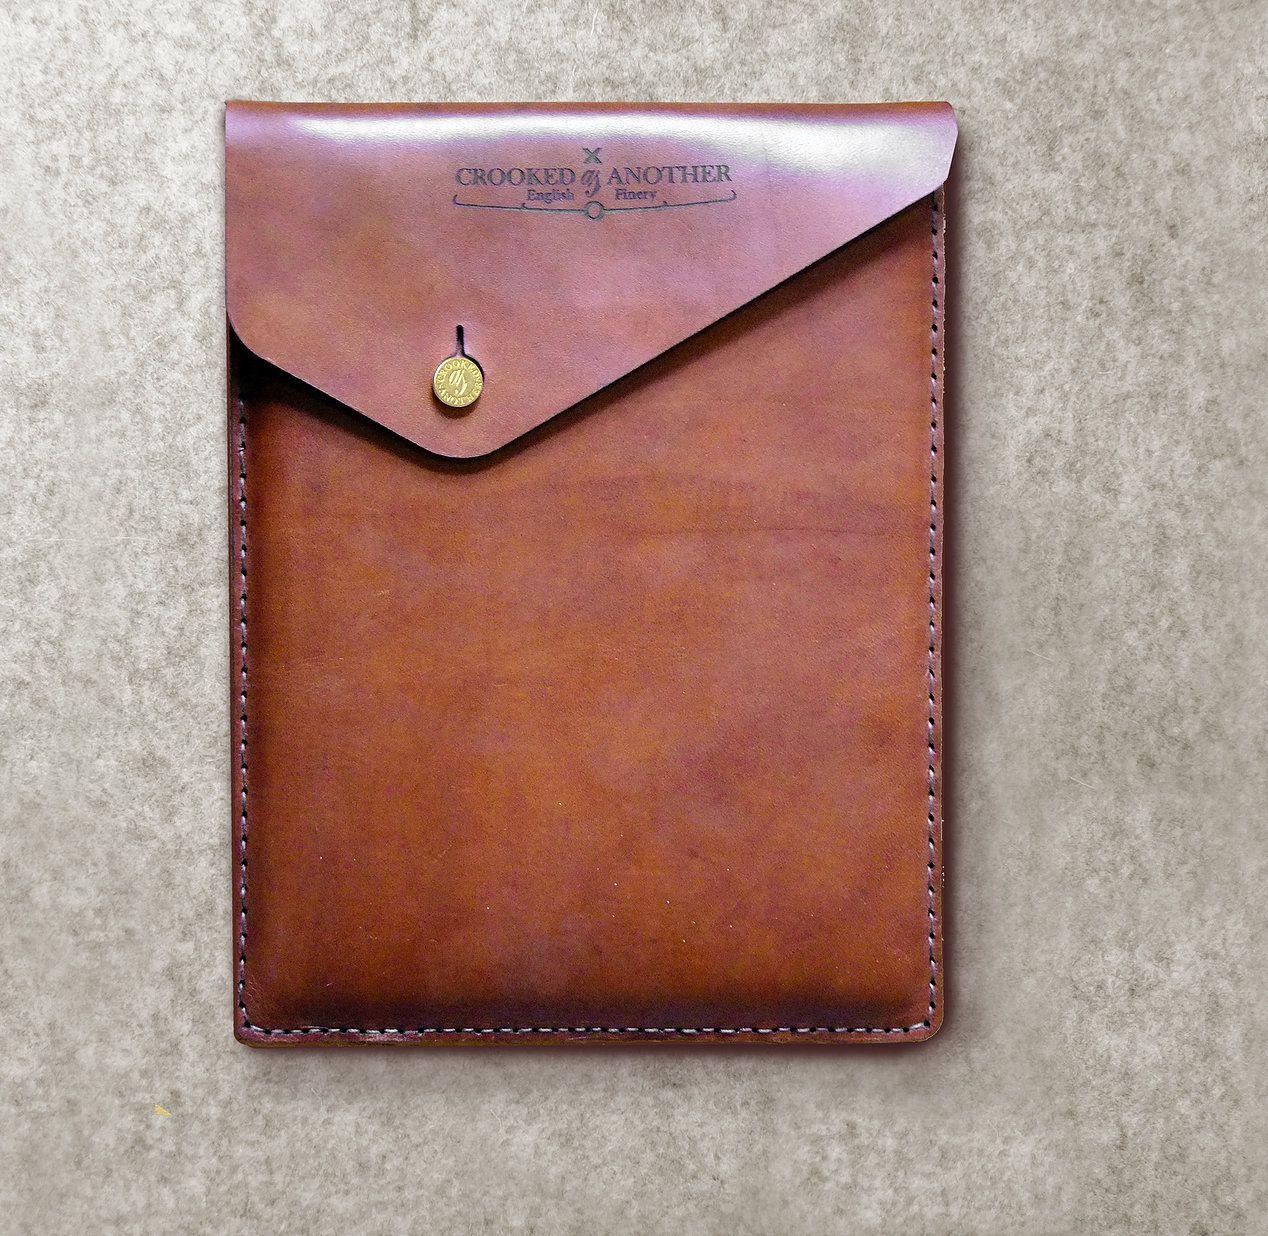 Leather Handbag Uk Design And Maker Based In York Yorkshire Making Handmade Bags Wallets Purses